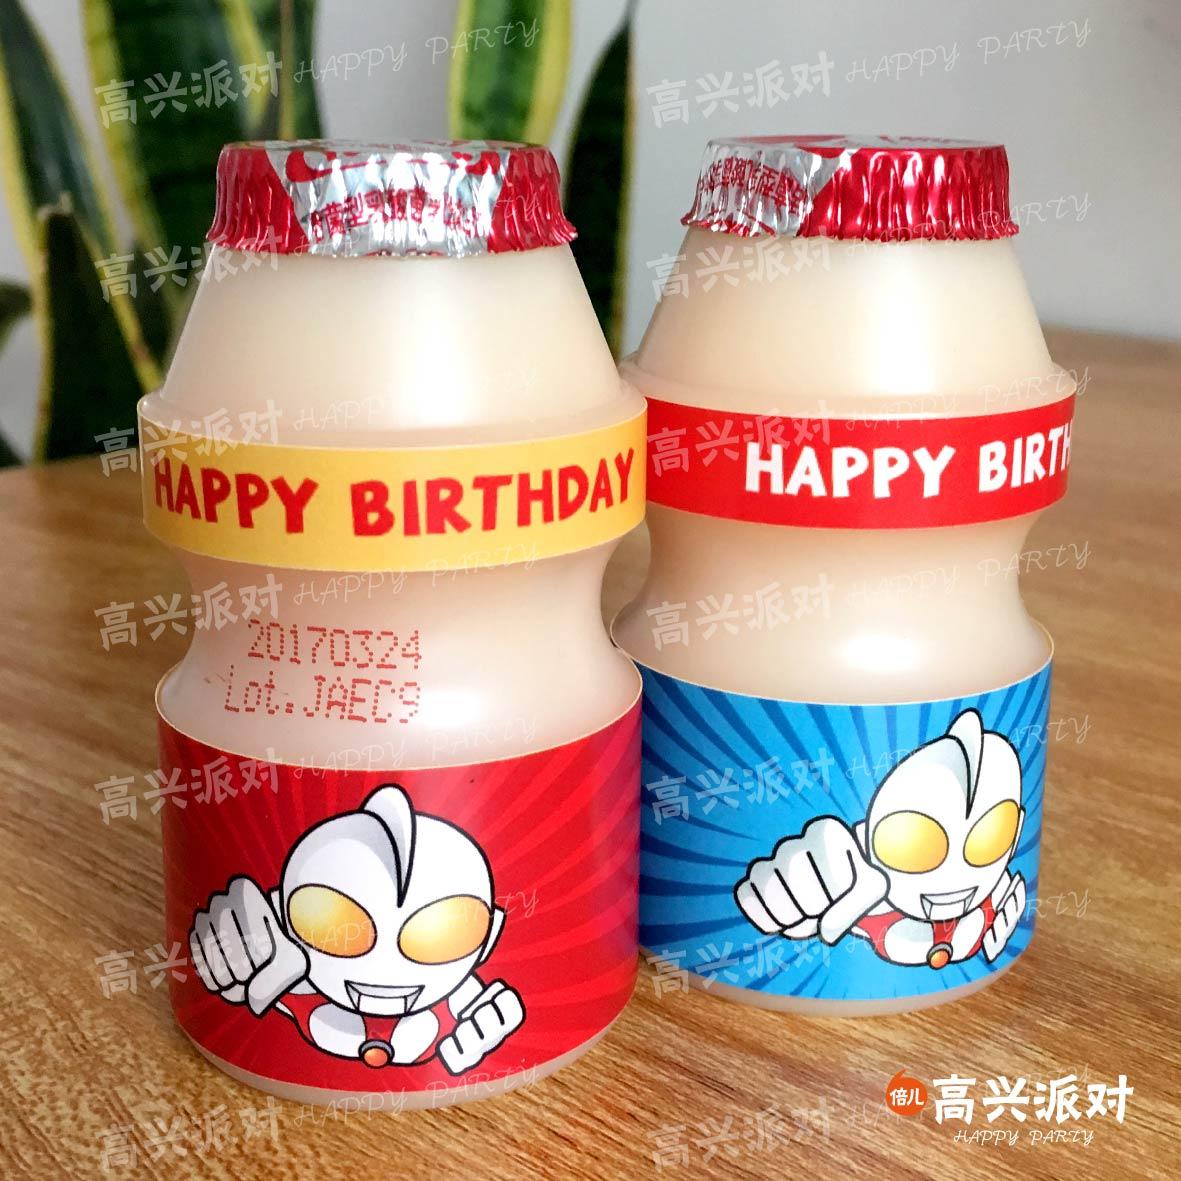 Ultraman theme party Yakult sticker party decoration birthday